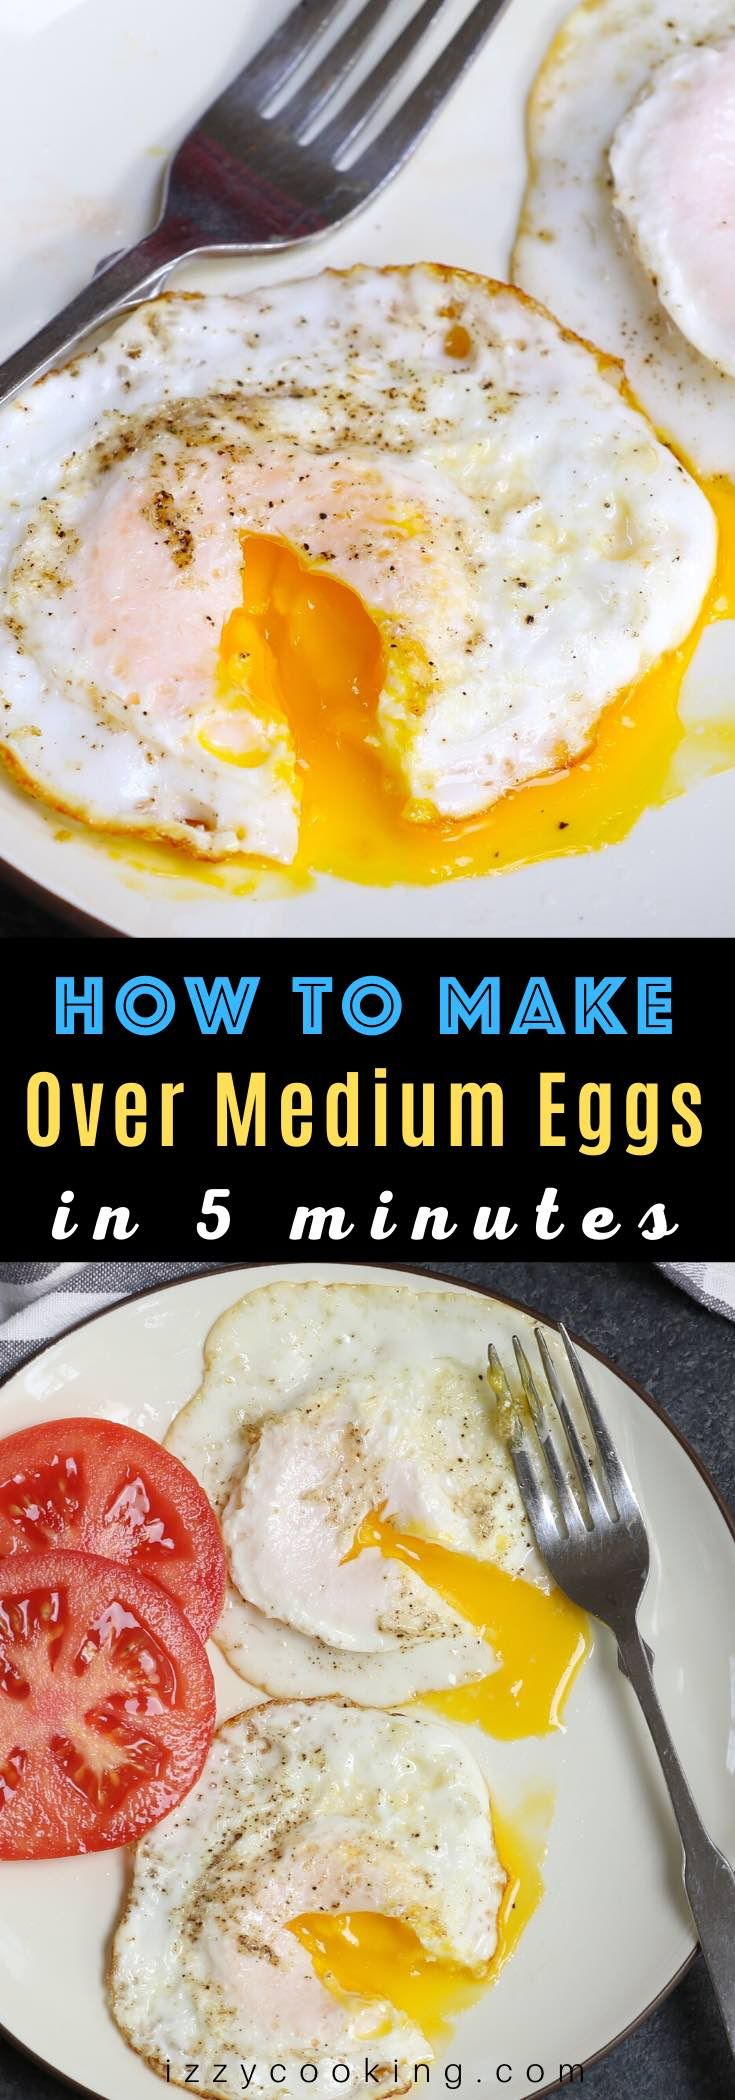 Easy Over Medium Eggs Recipe In 2020 Food Recipes Quick Easy Meals